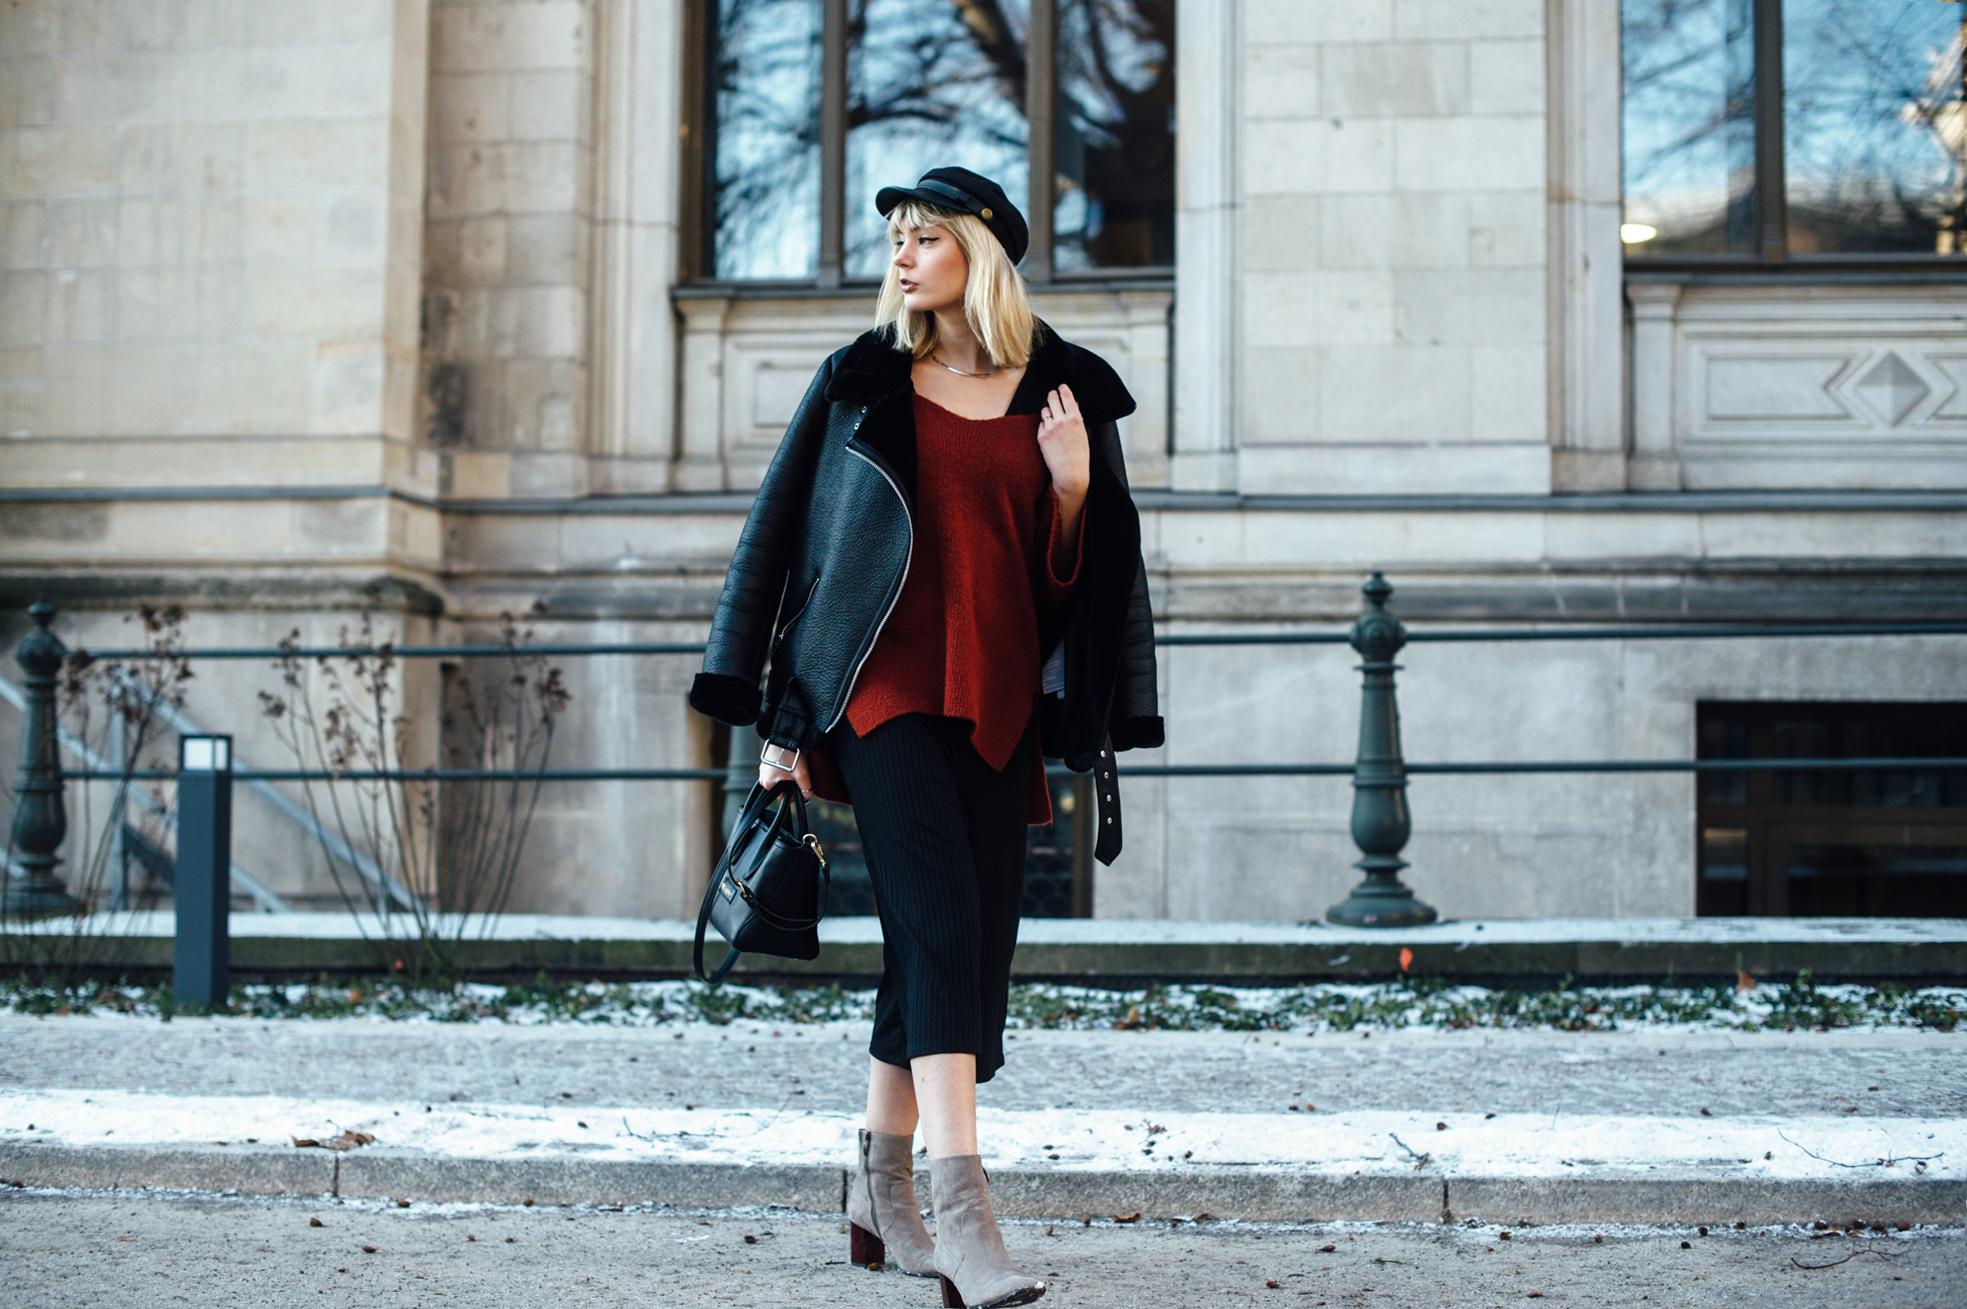 04-Kiamisu-Modeblog-Fashion Week Berlin_Shearling Jacke_Tamaris Stiefeletten_Schiebermütze-4